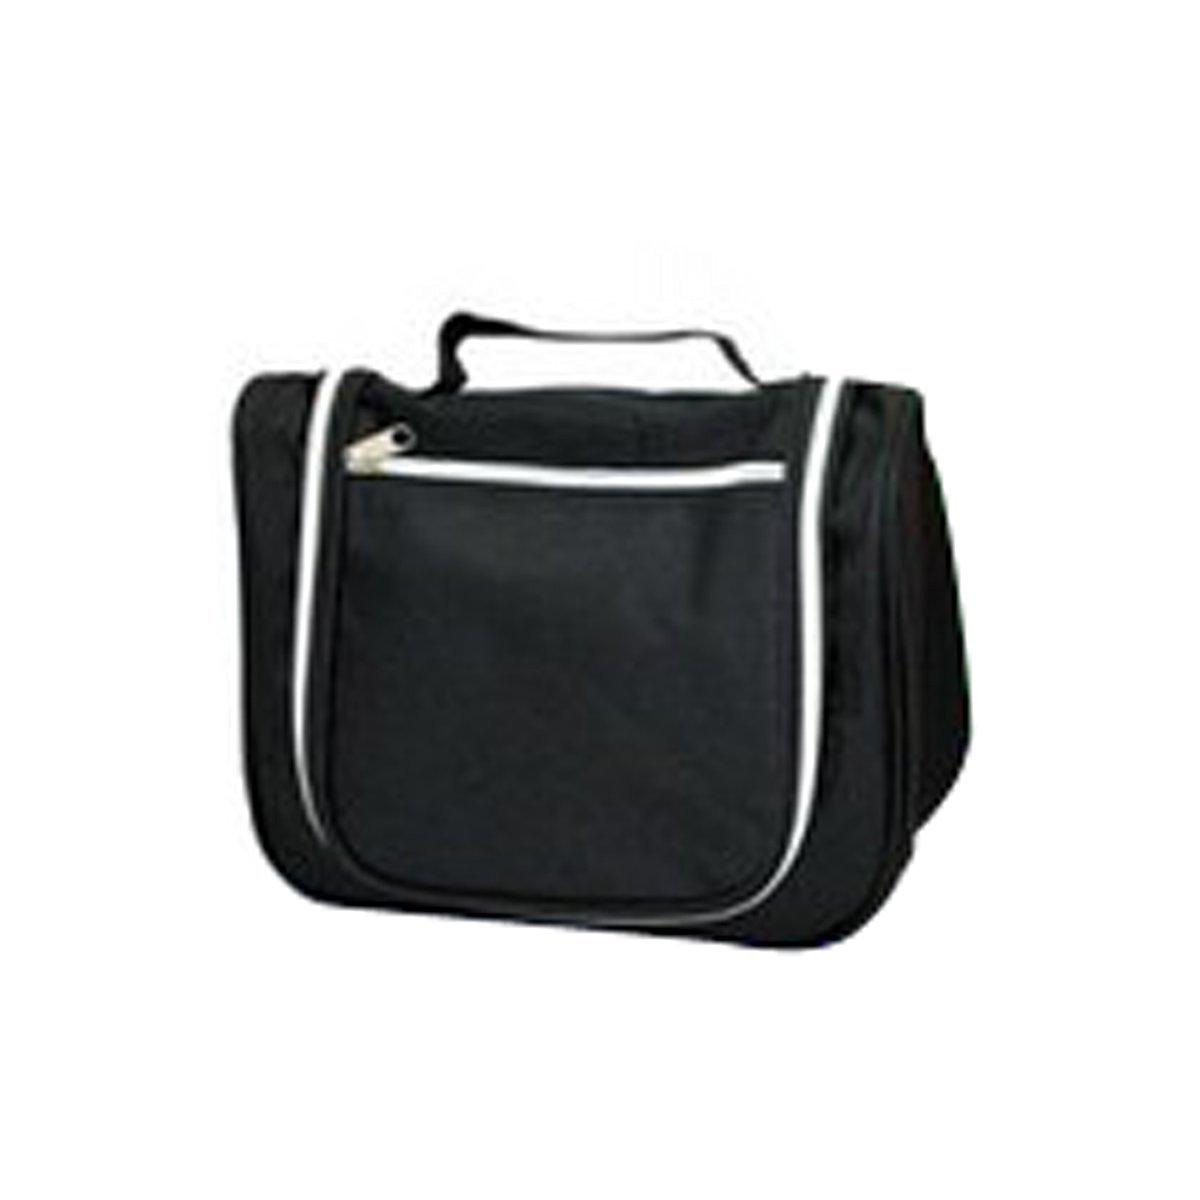 DEHANG Waterproof Nylon Ventilated Durable Portable Organiser Storage Cosmetic Big Bag With Handle - Black